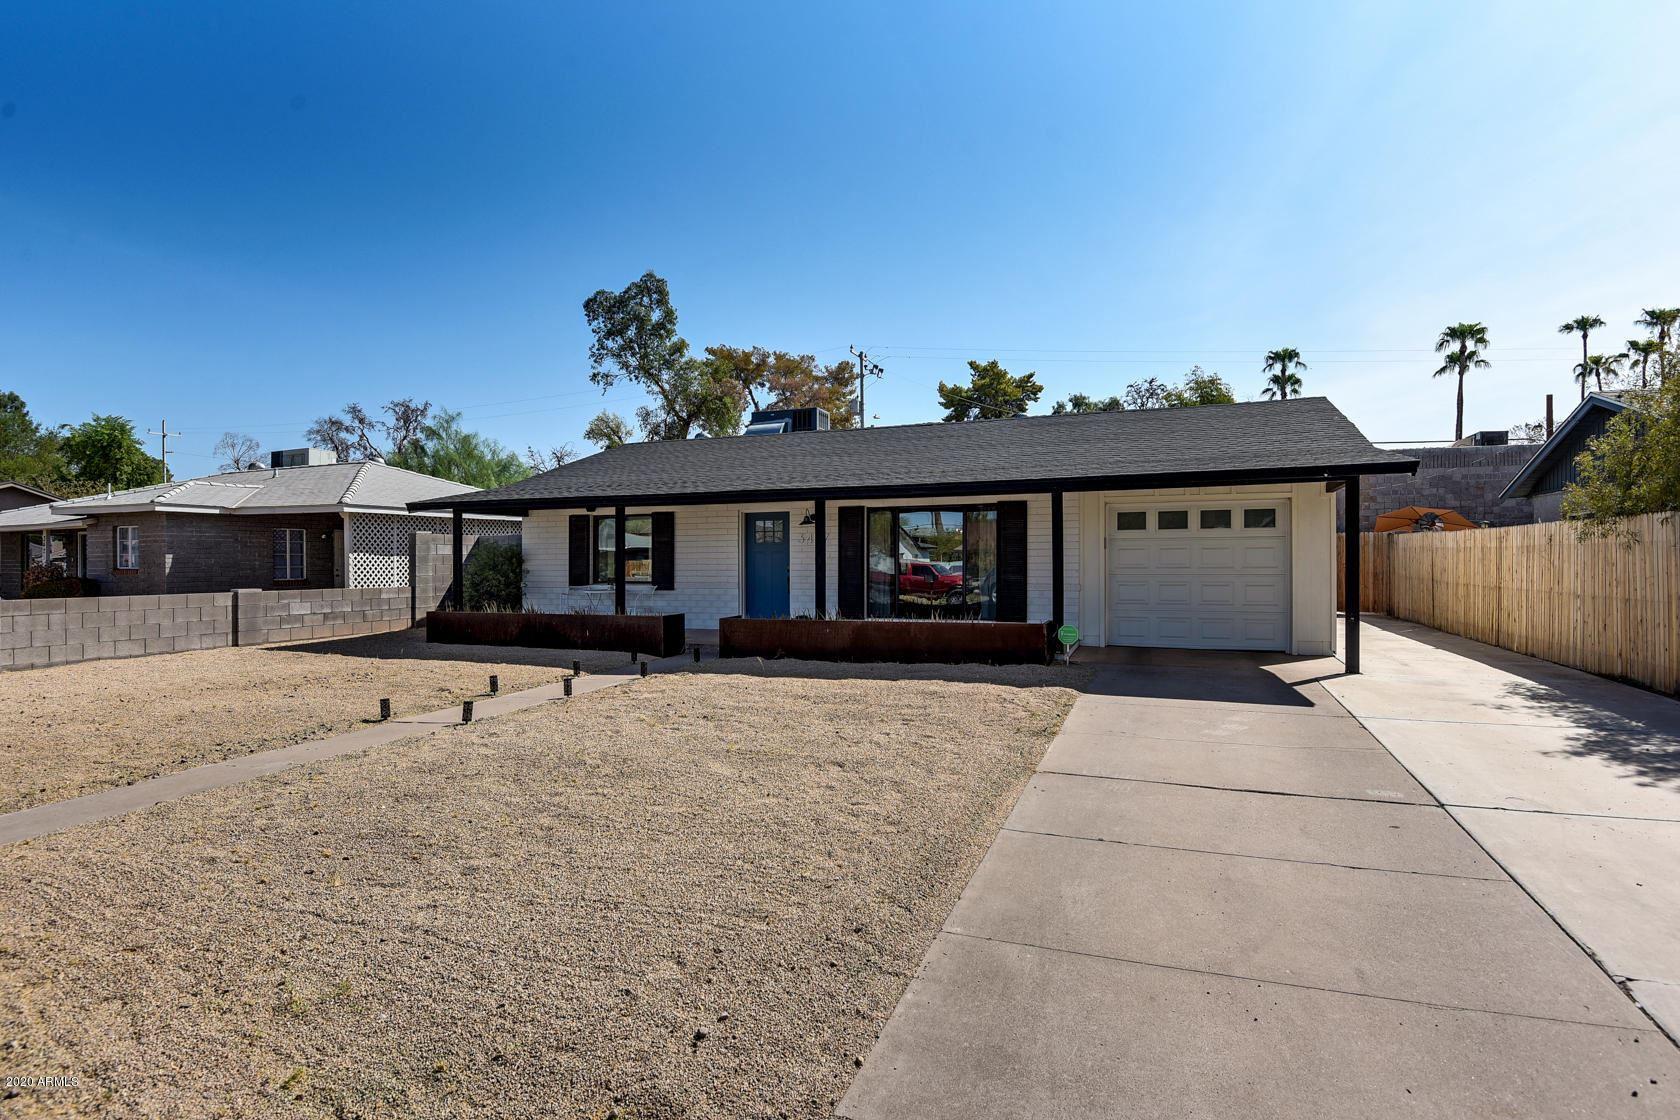 3417 N 14TH Place, Phoenix, AZ 85014 - #: 6131041